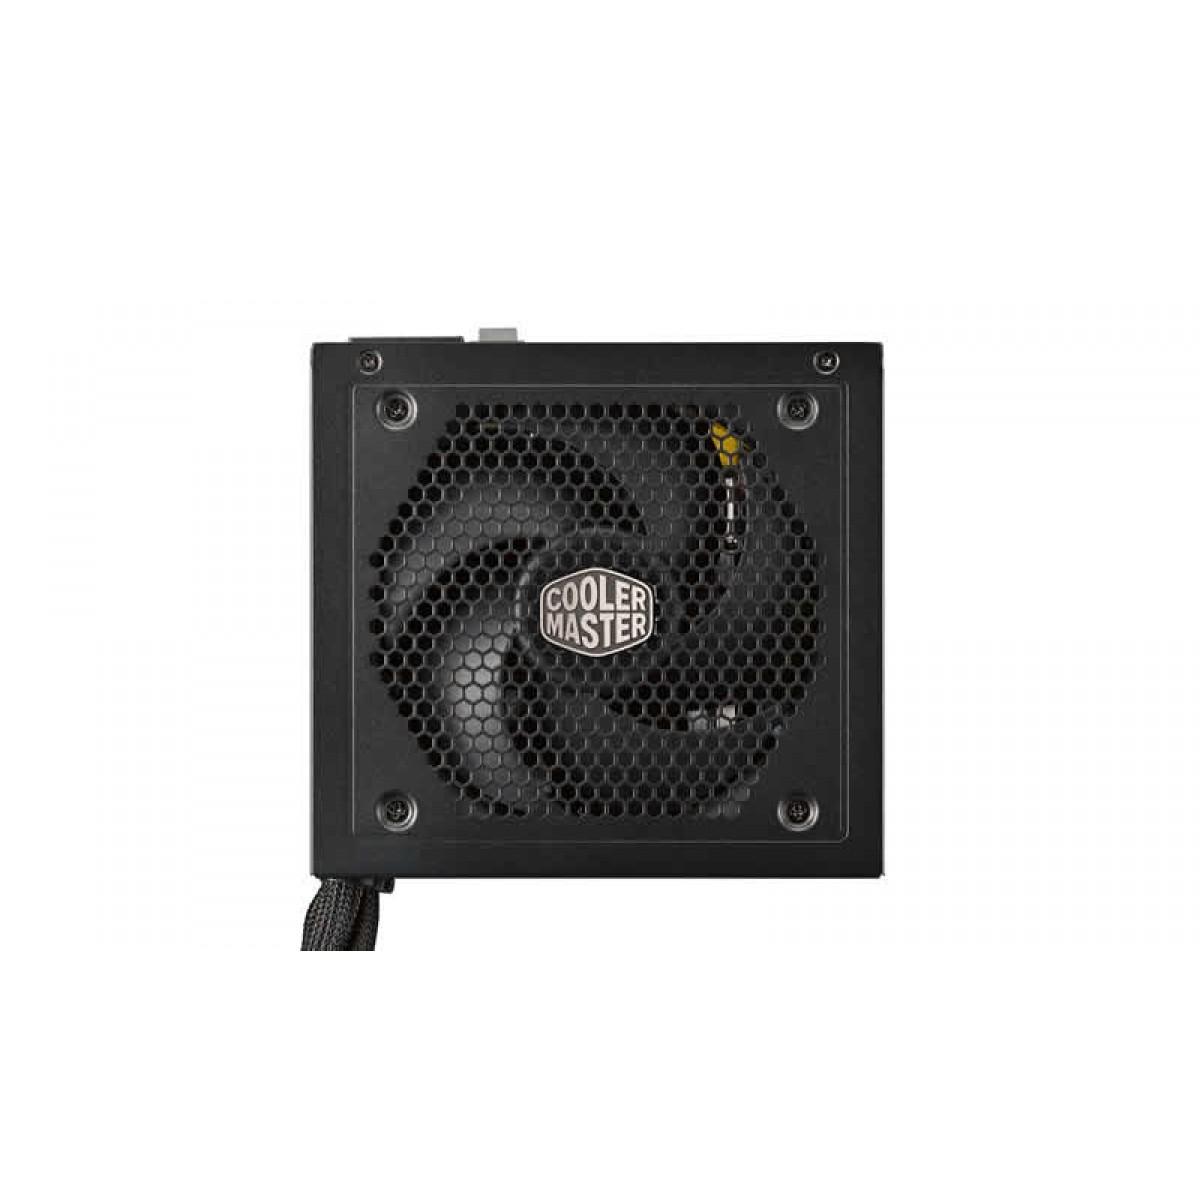 Fonte Cooler Master Masterwatt V550, 550W, 80 Plus Bronze, Semi-Modular, PFC Ativo, MPX-5501-AMAAB-WO